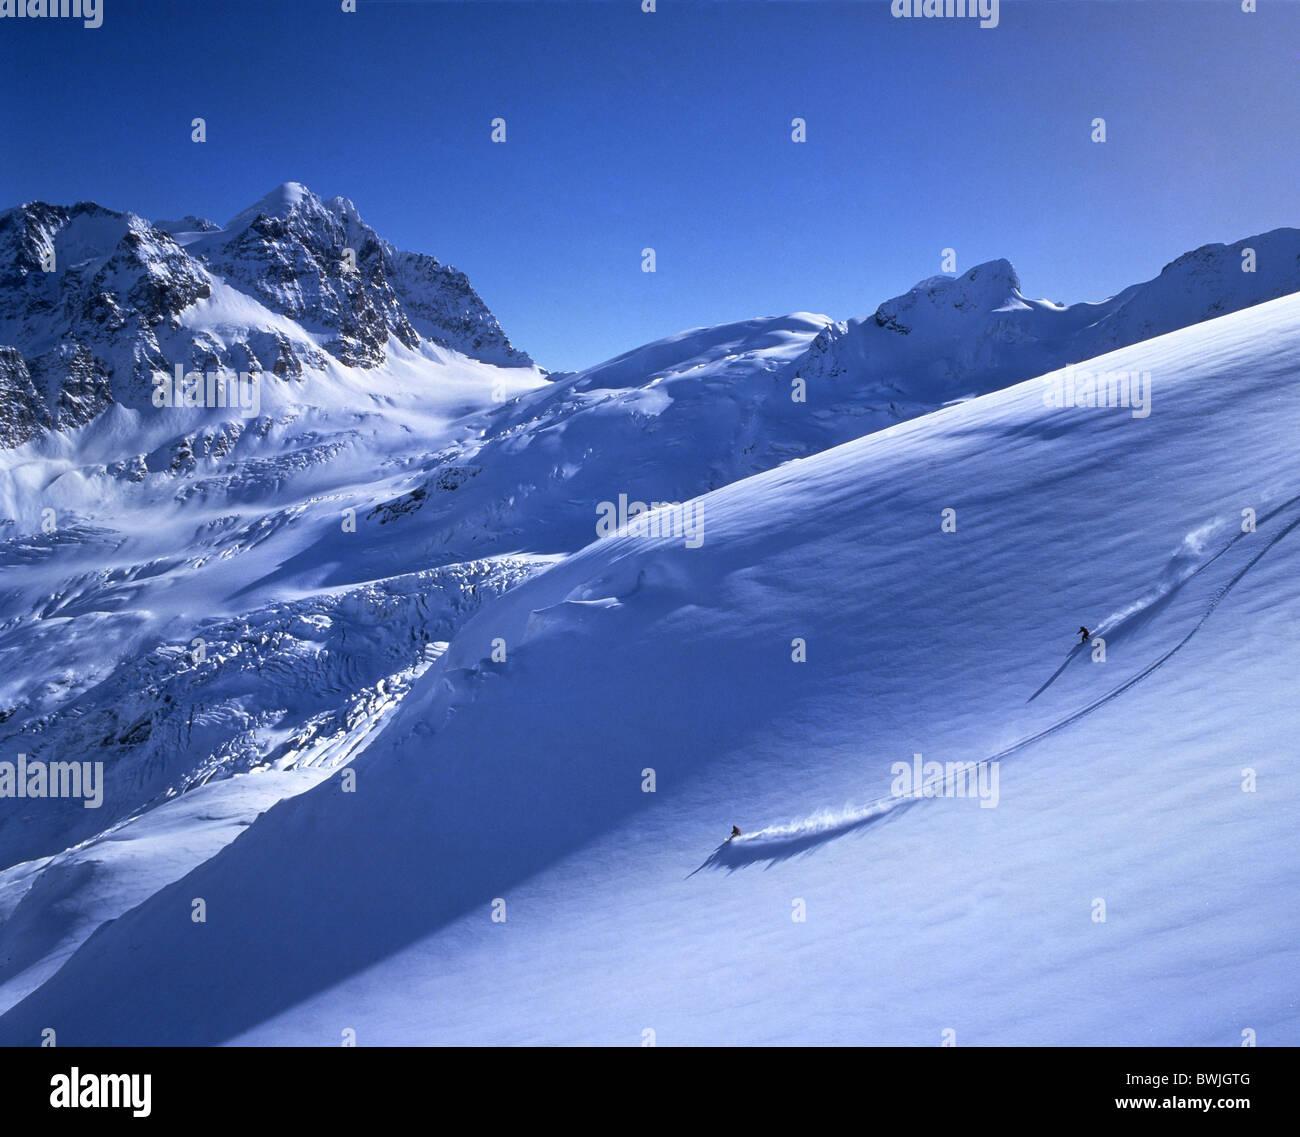 snowboard deep snow free riding slope inclination bernina region